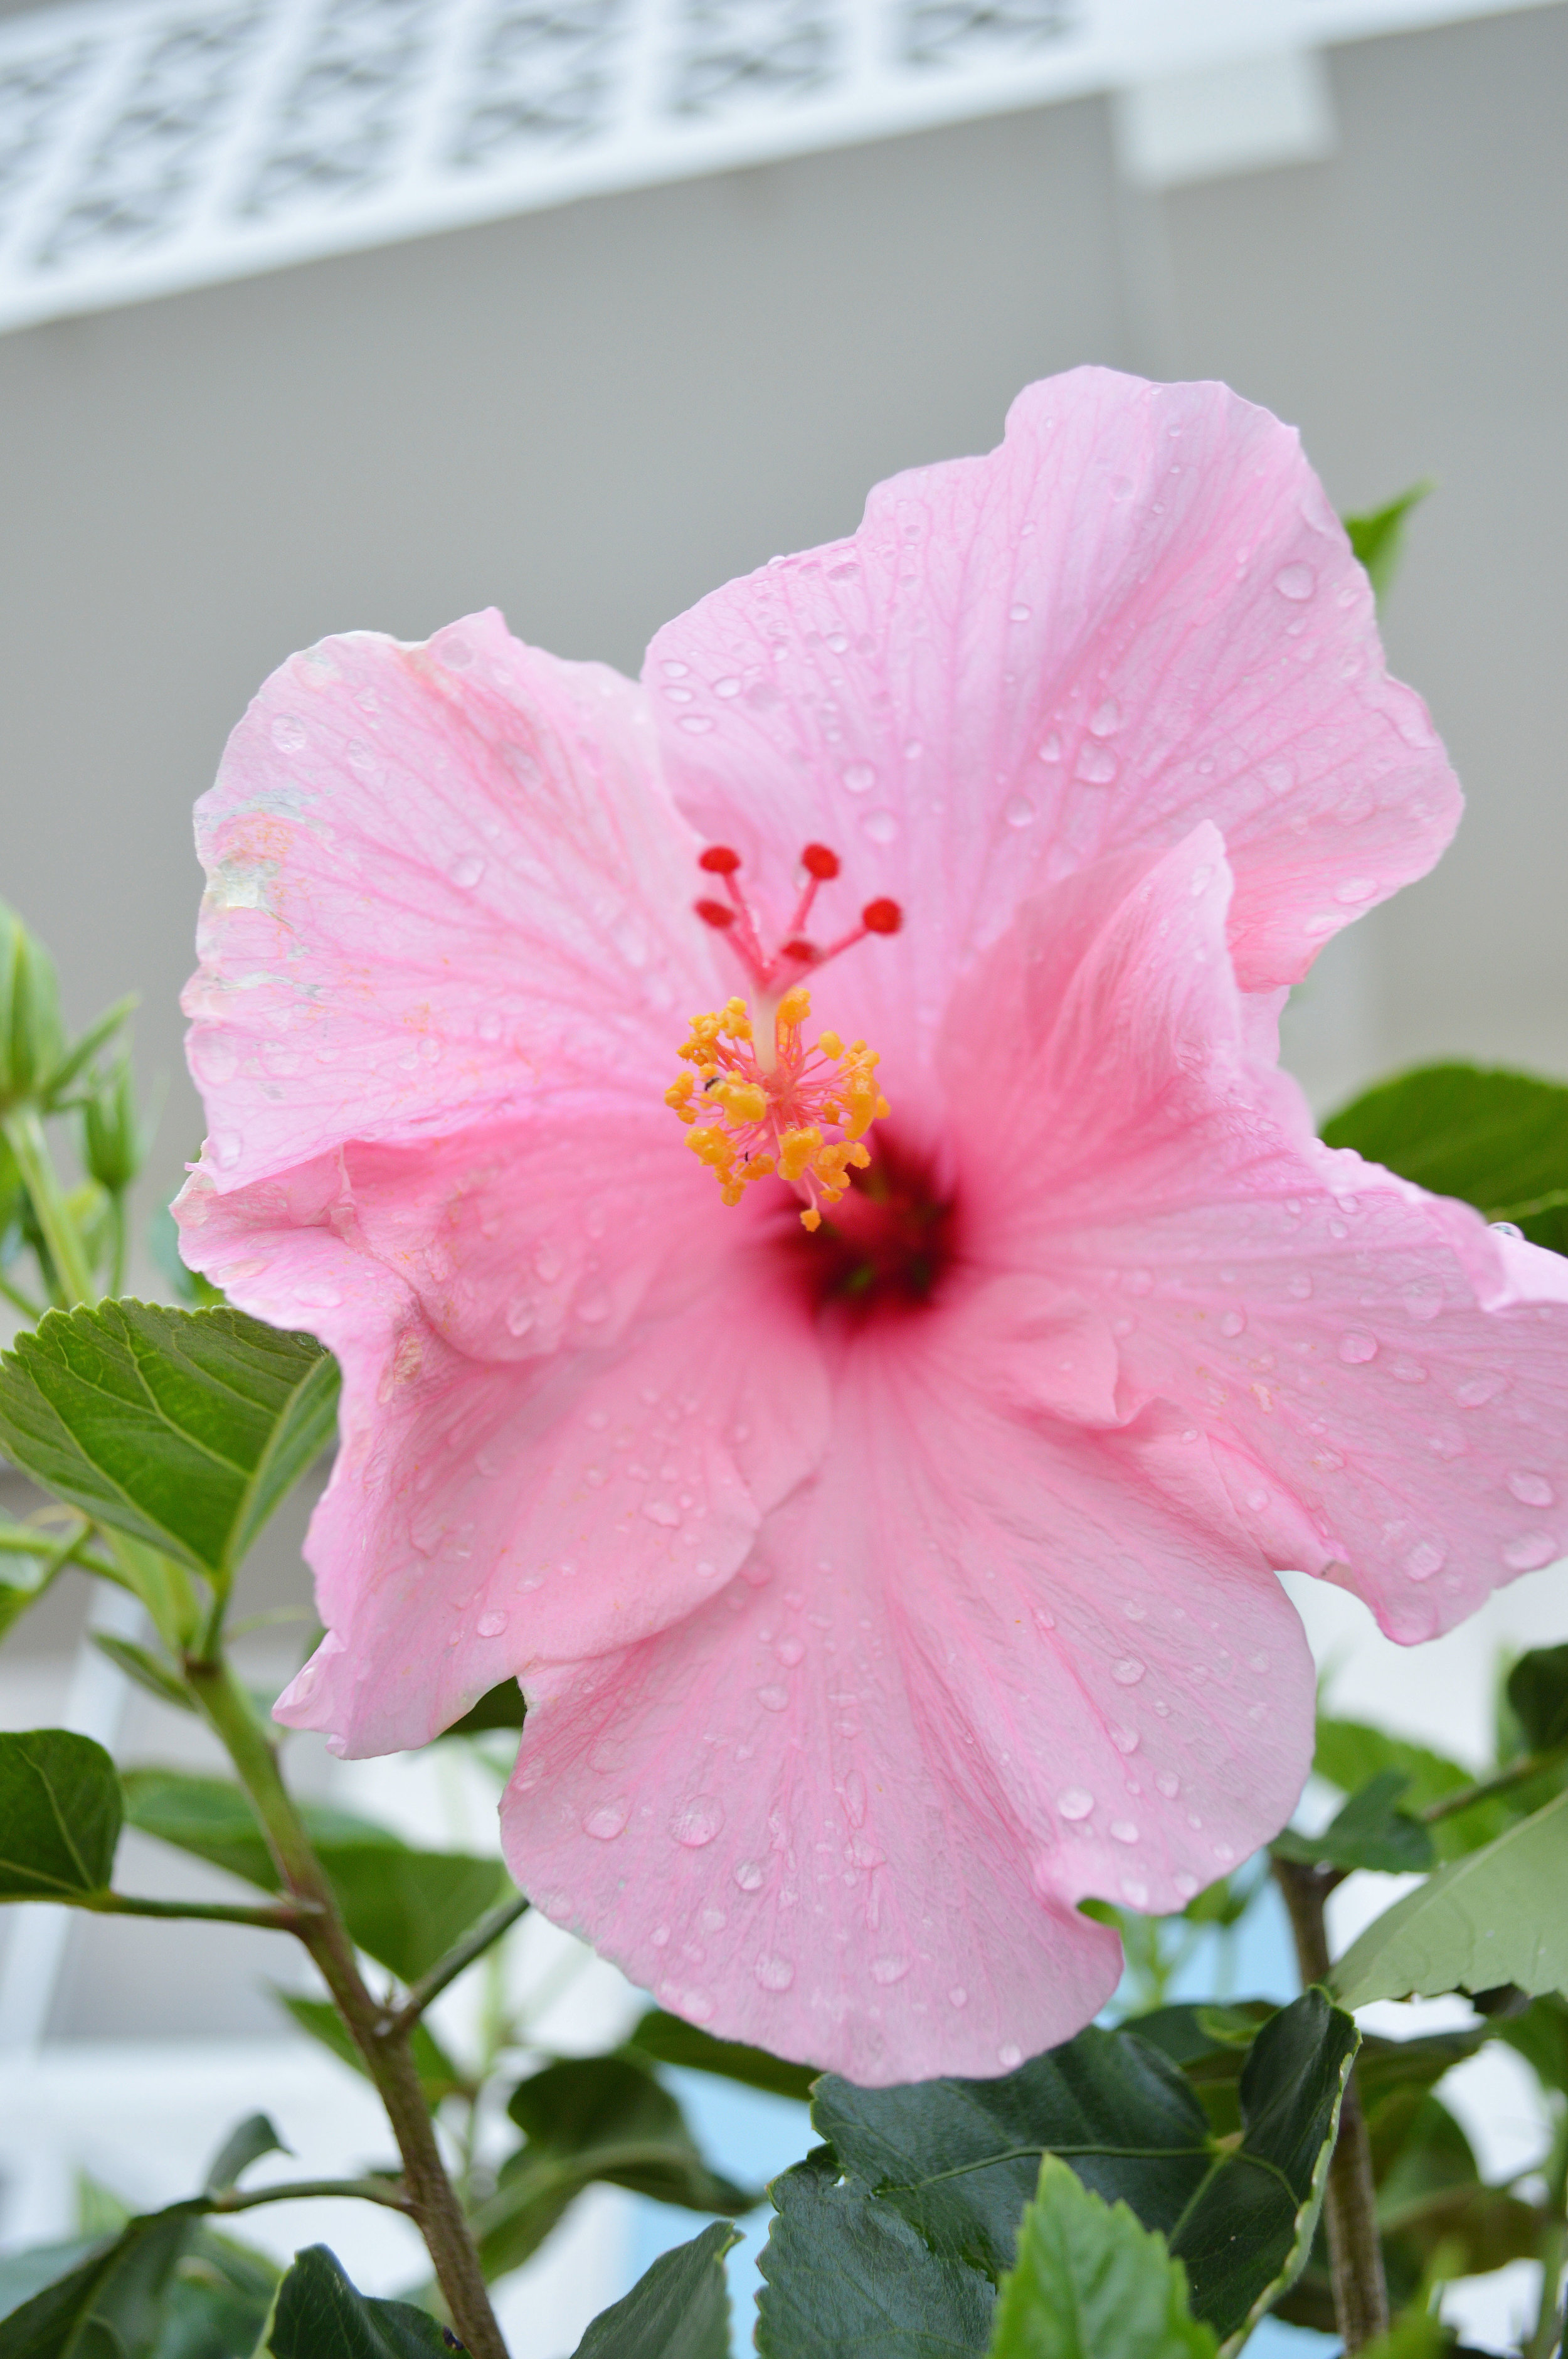 Hibiscus Flower Lido Key Sarasota Florida Photo by Kristen Laczi